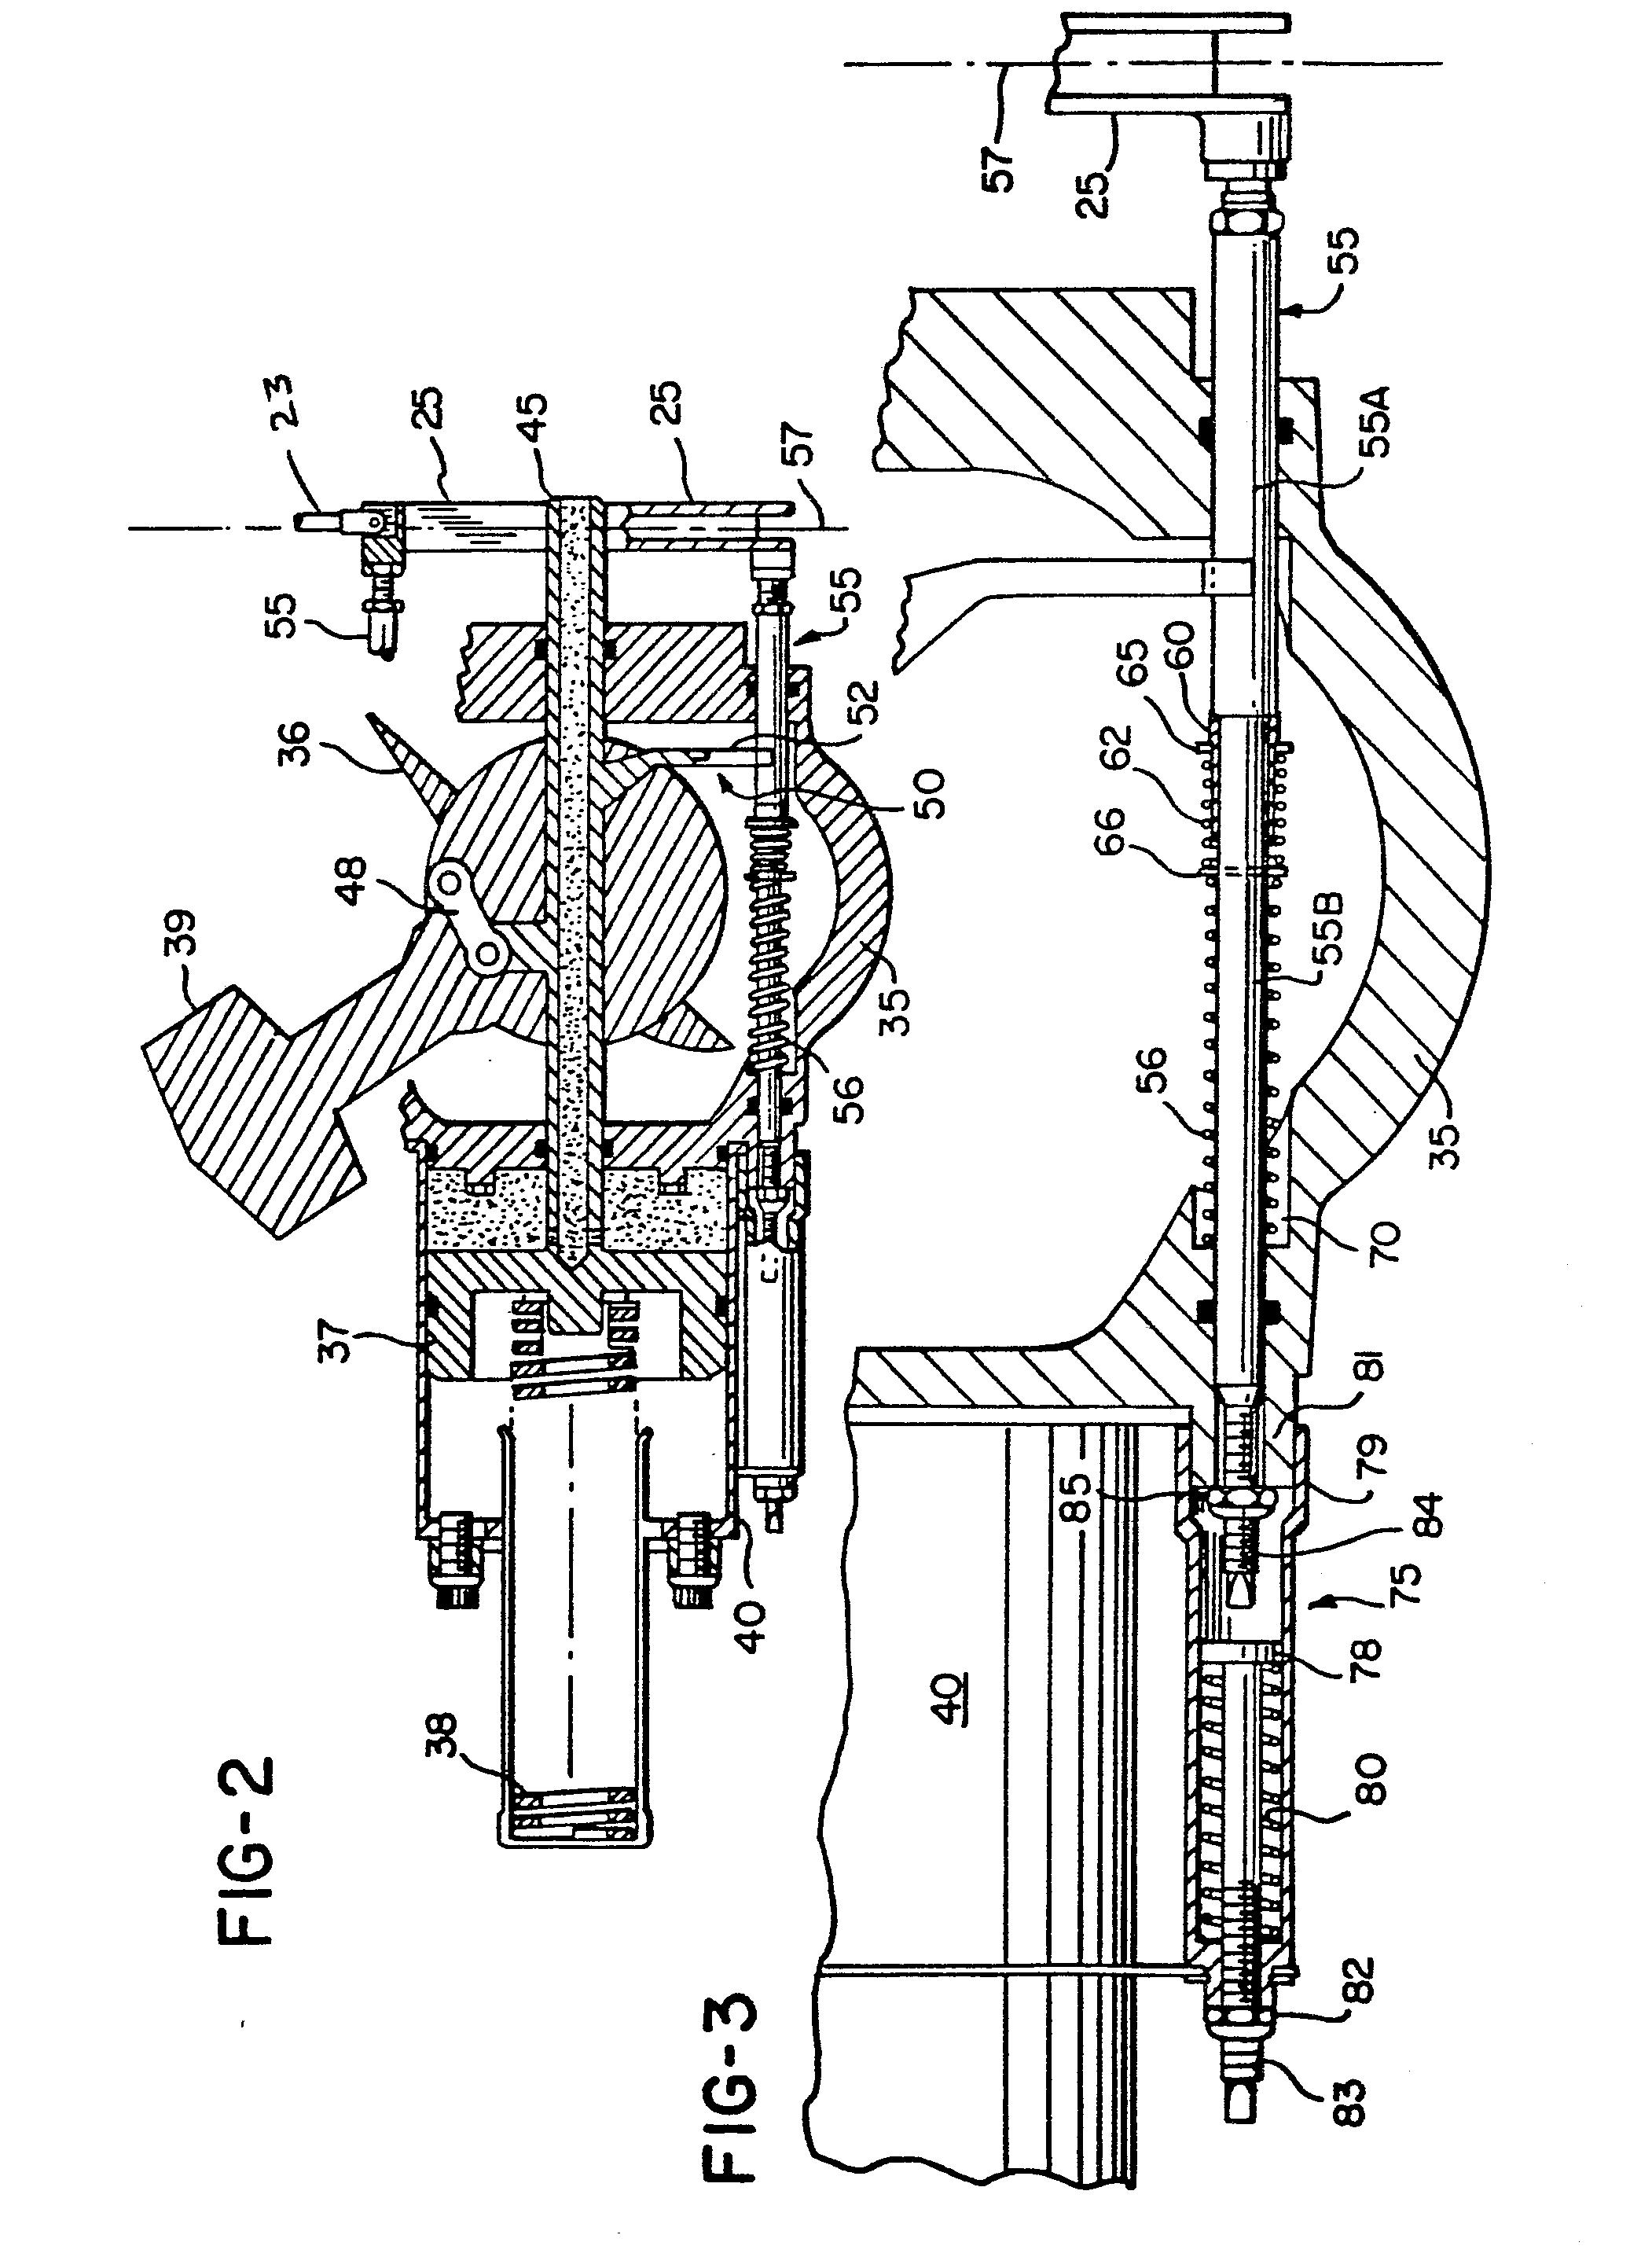 hartzell propeller diagram  diagrams  auto parts catalog